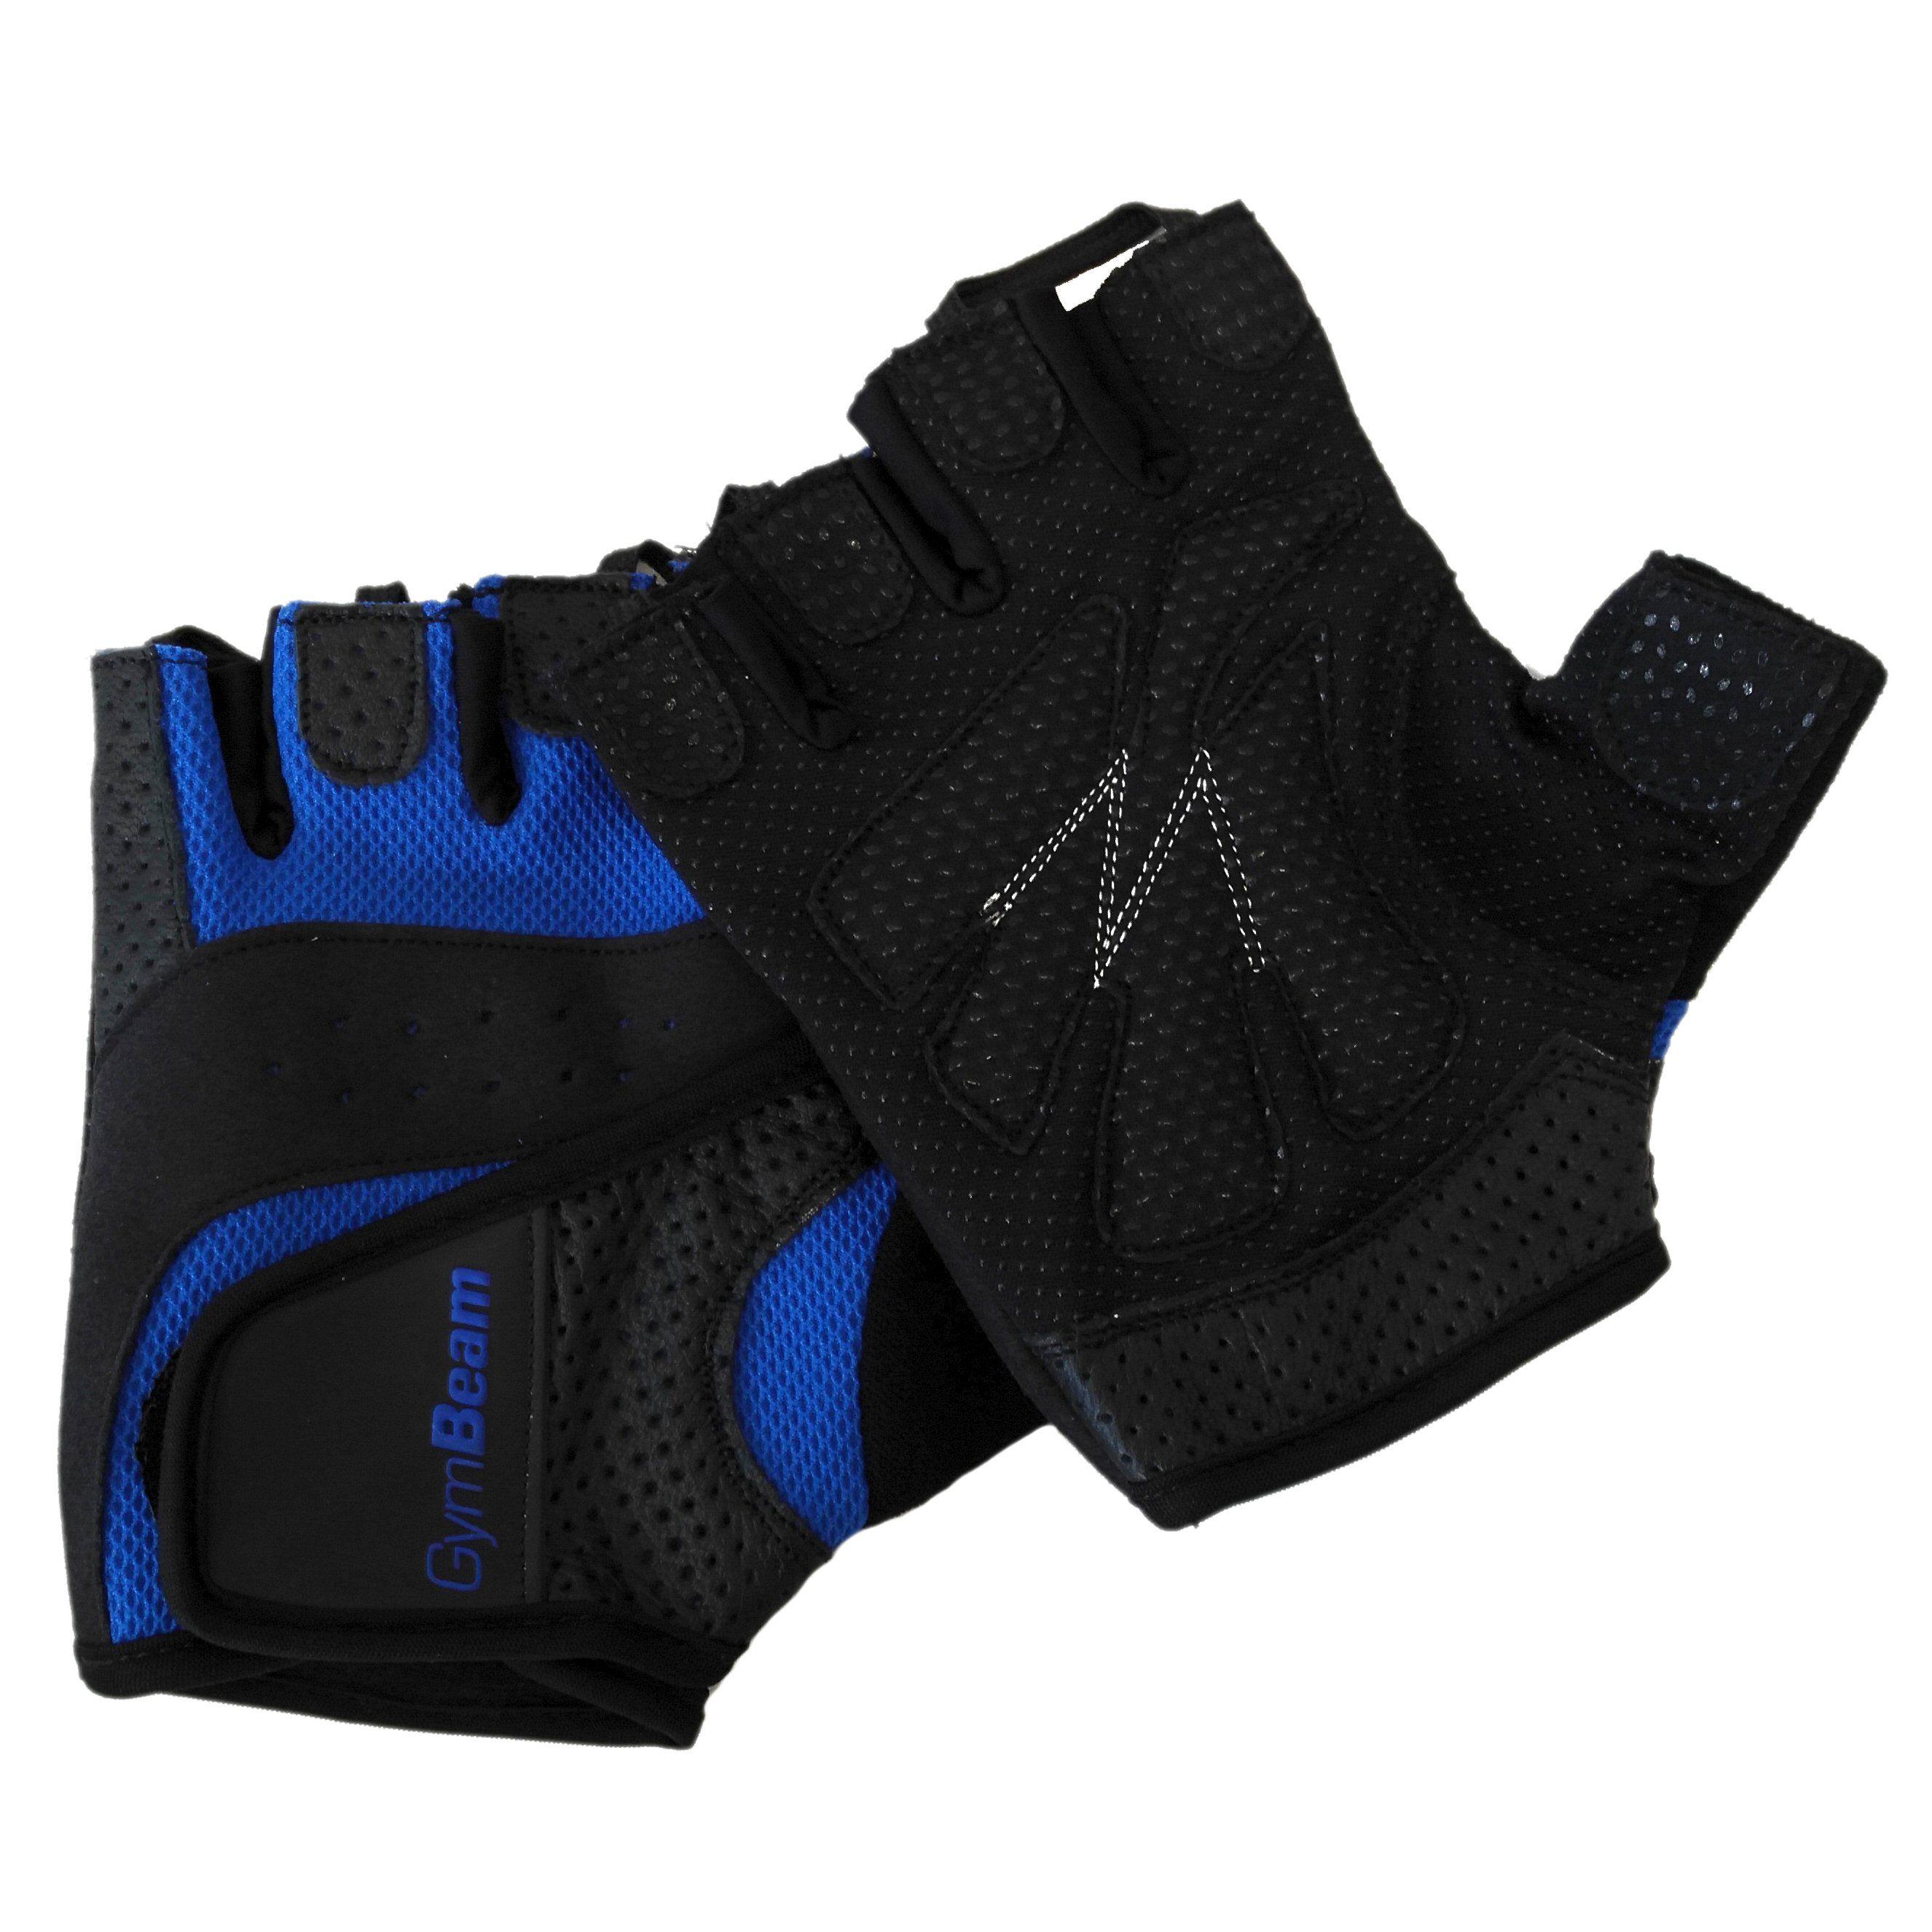 Fitness rukavice Dexter - GymBeam - S